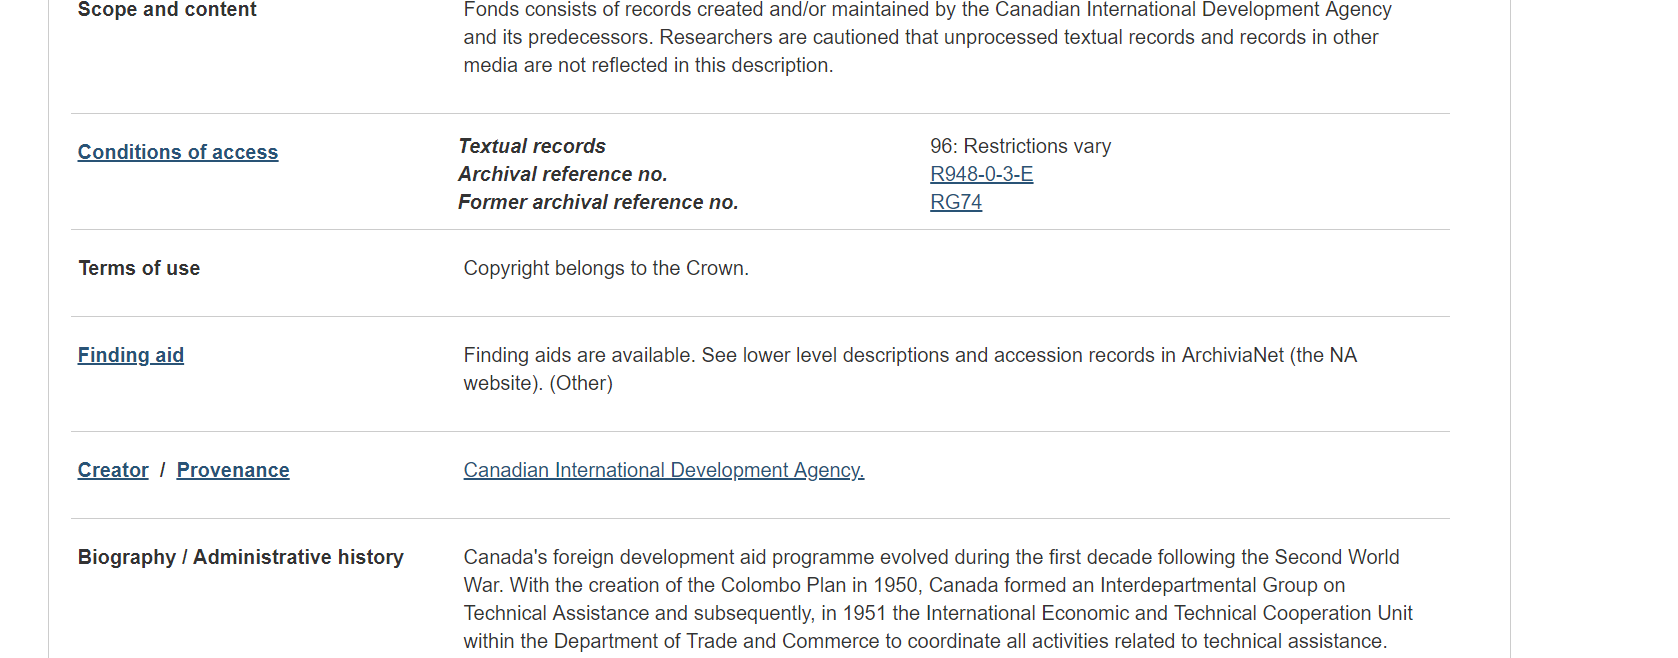 Screen shot of fonds level description